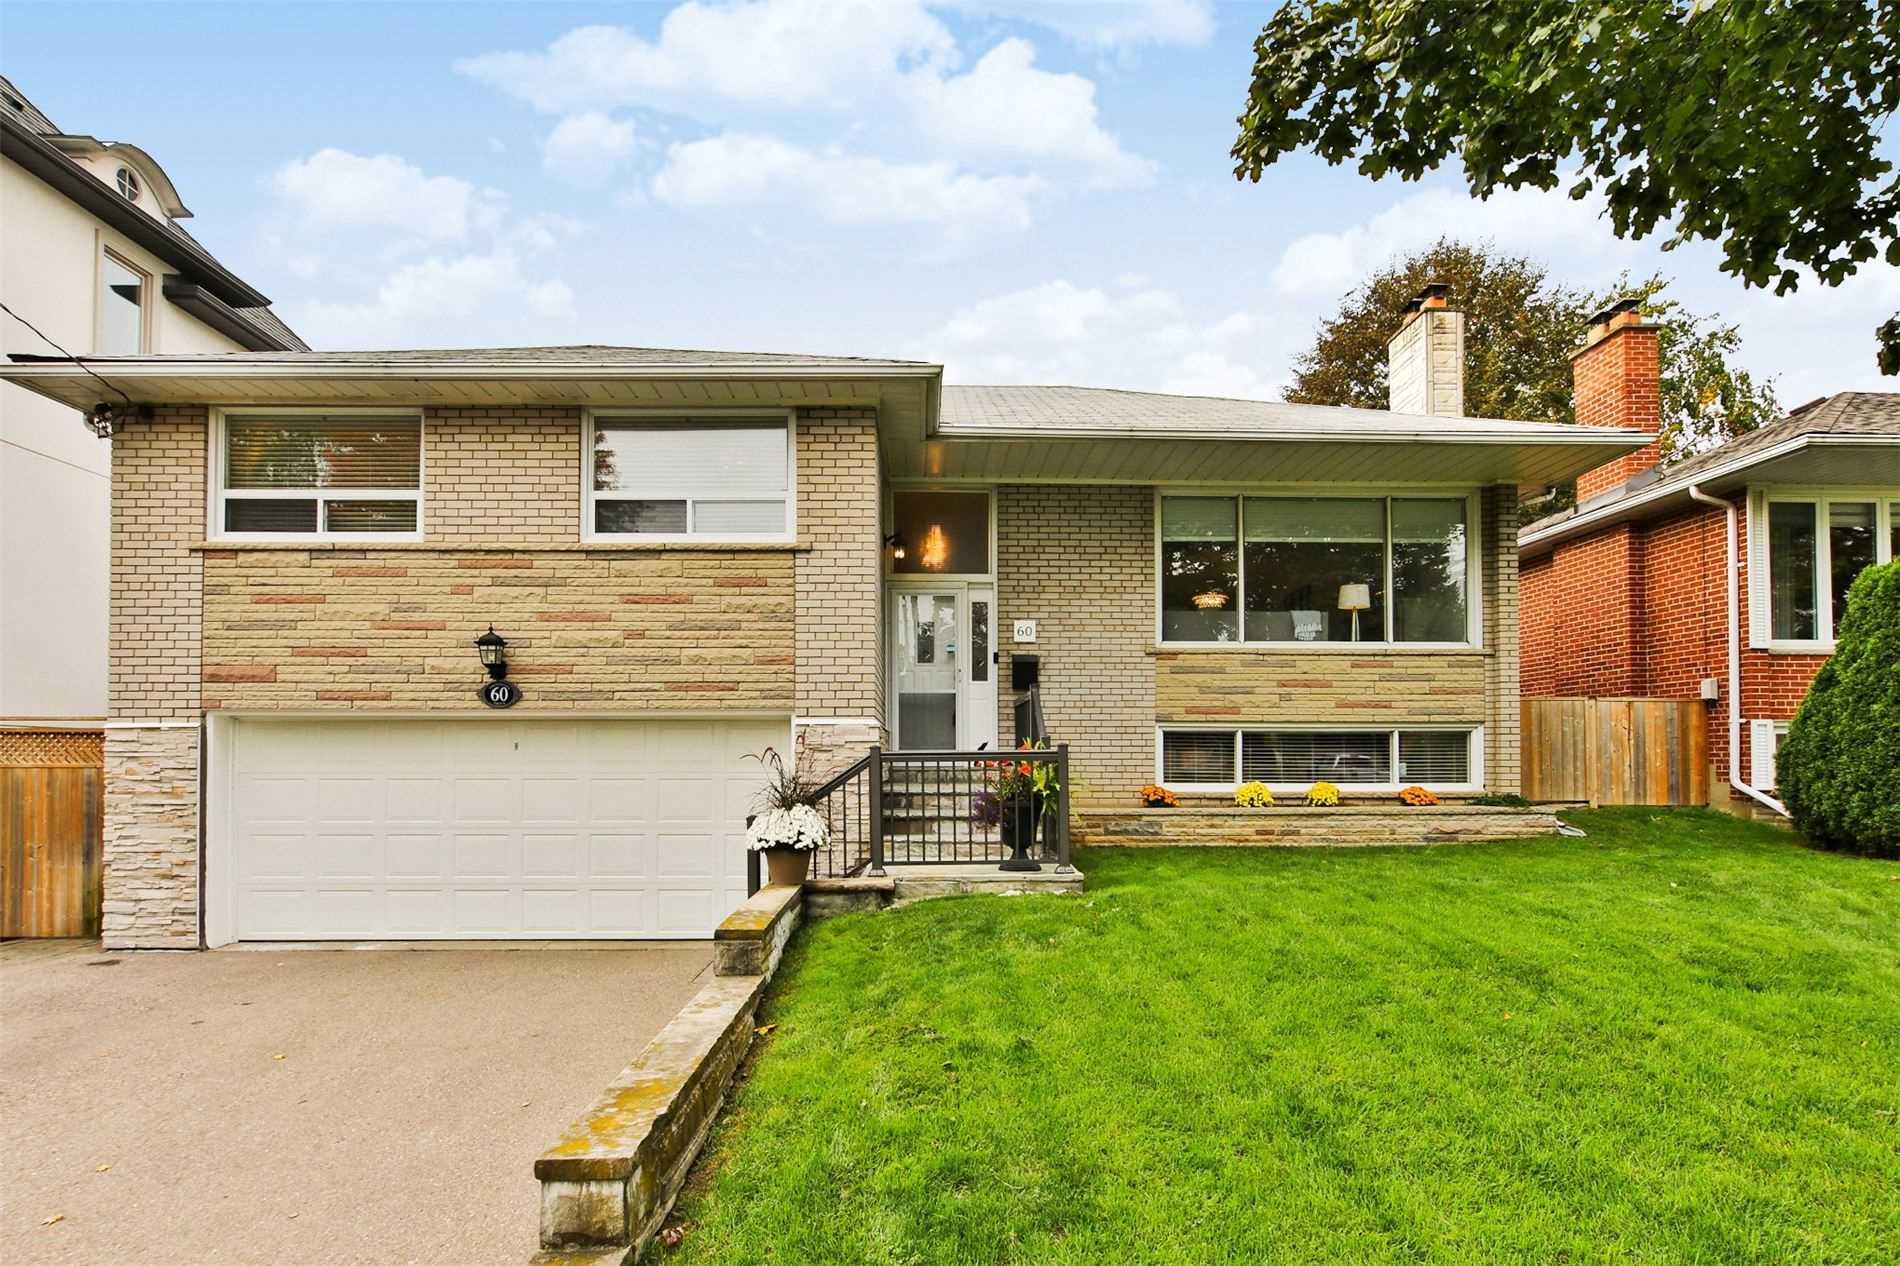 60 Smithwood Dr - Islington-City Centre West Detached for sale, 3 Bedrooms (W5402110) - #1